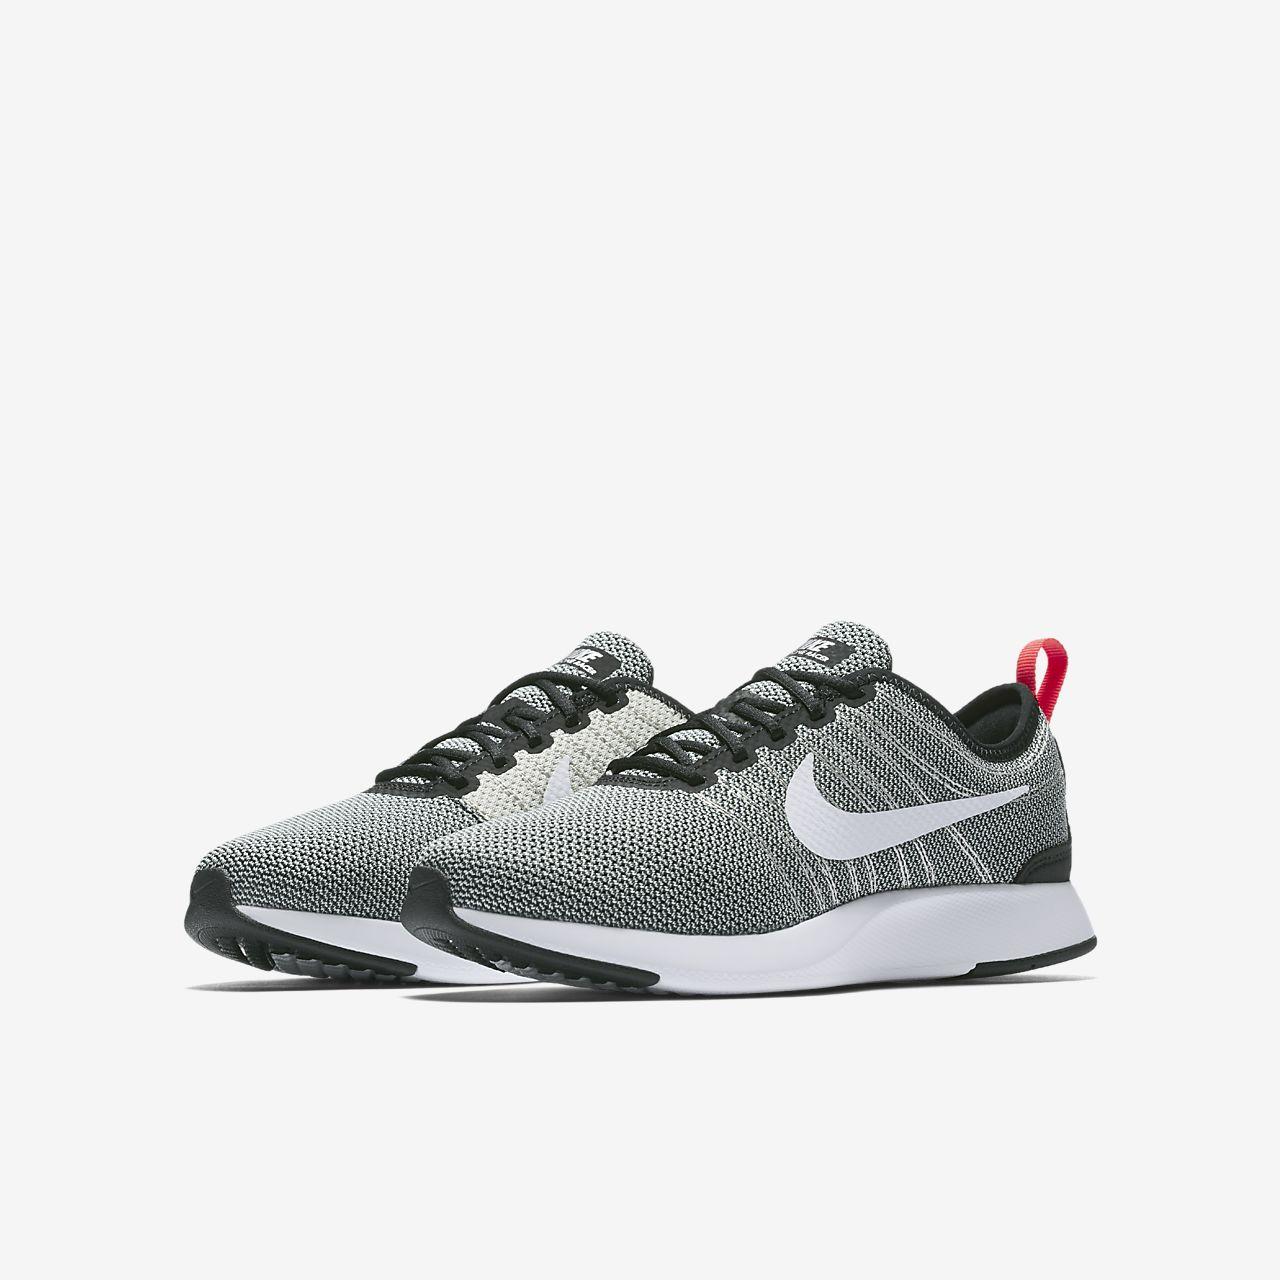 ... Nike Dualtone Racer Older Kids' Shoe